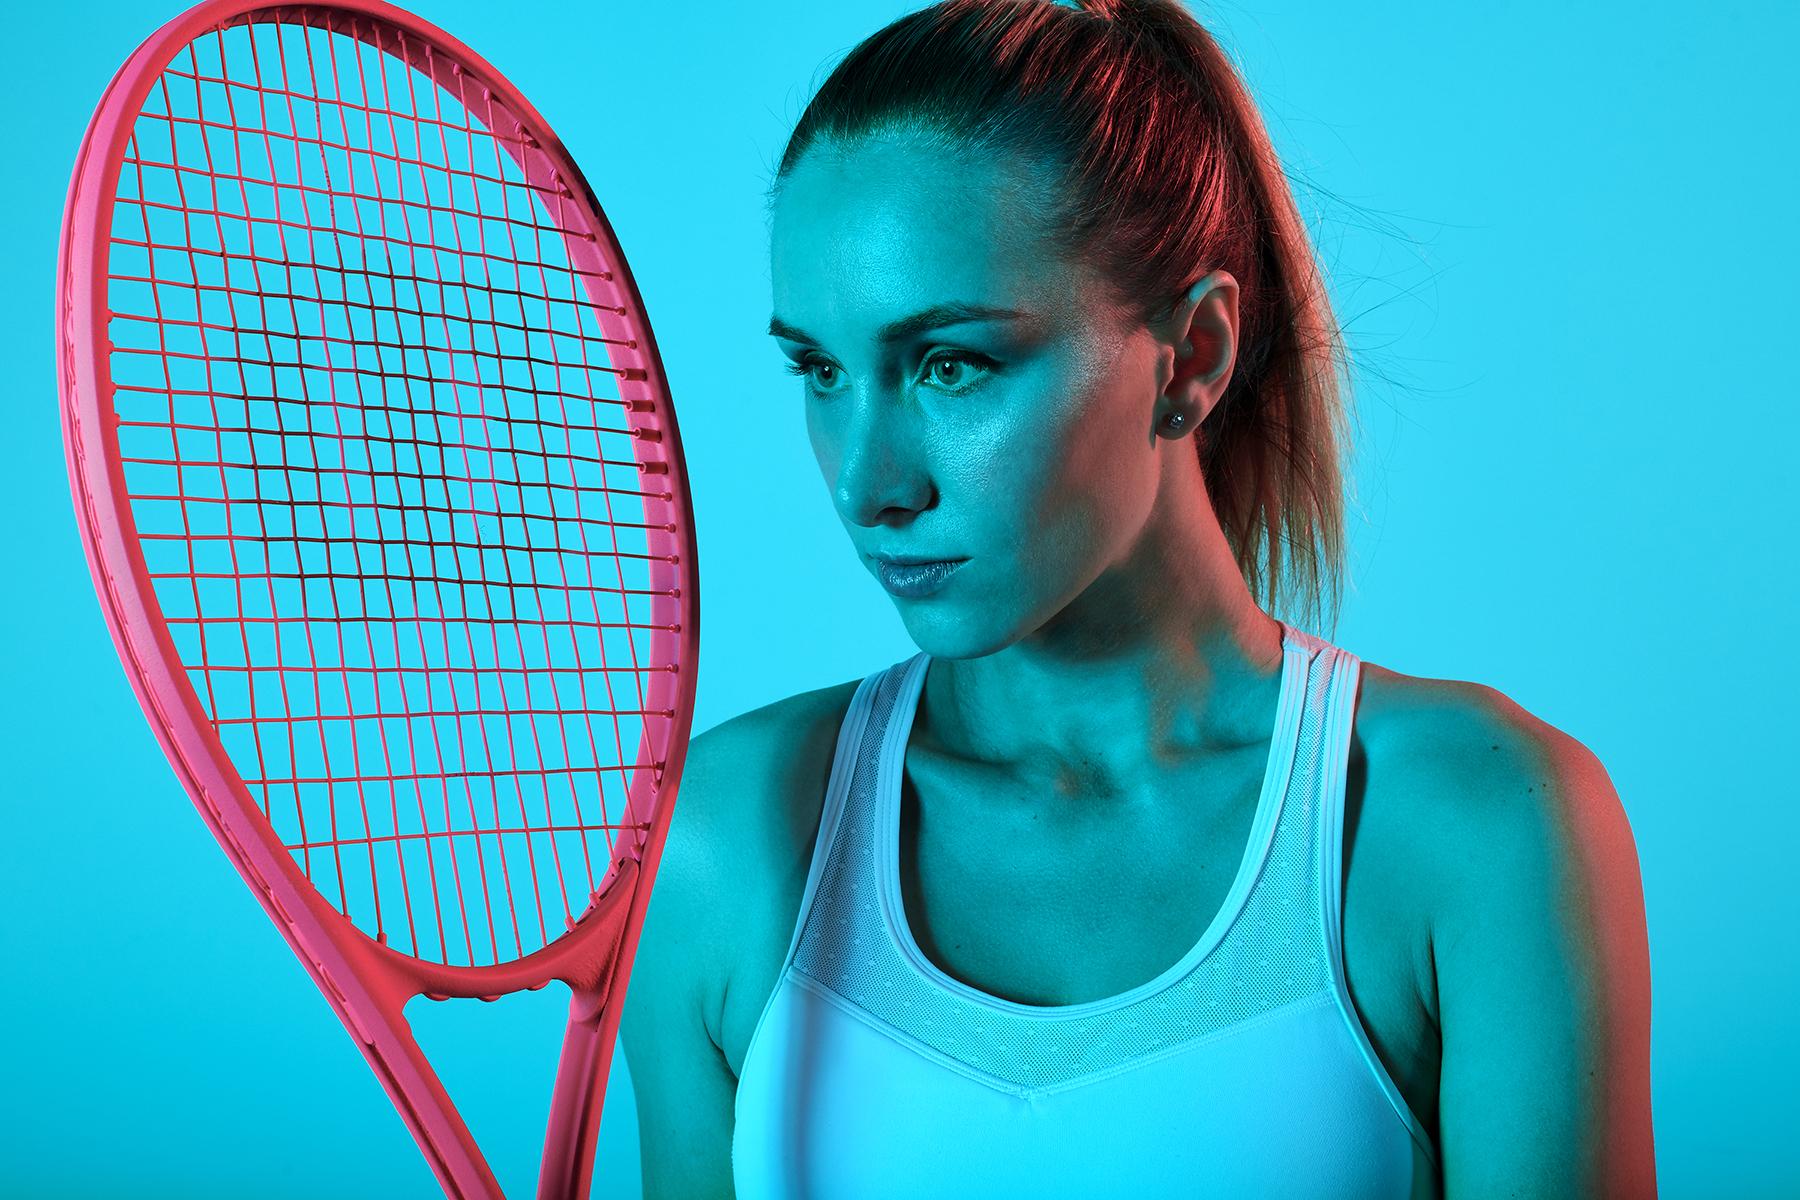 20181111_Tennis12360_FINAL_WEB.jpg